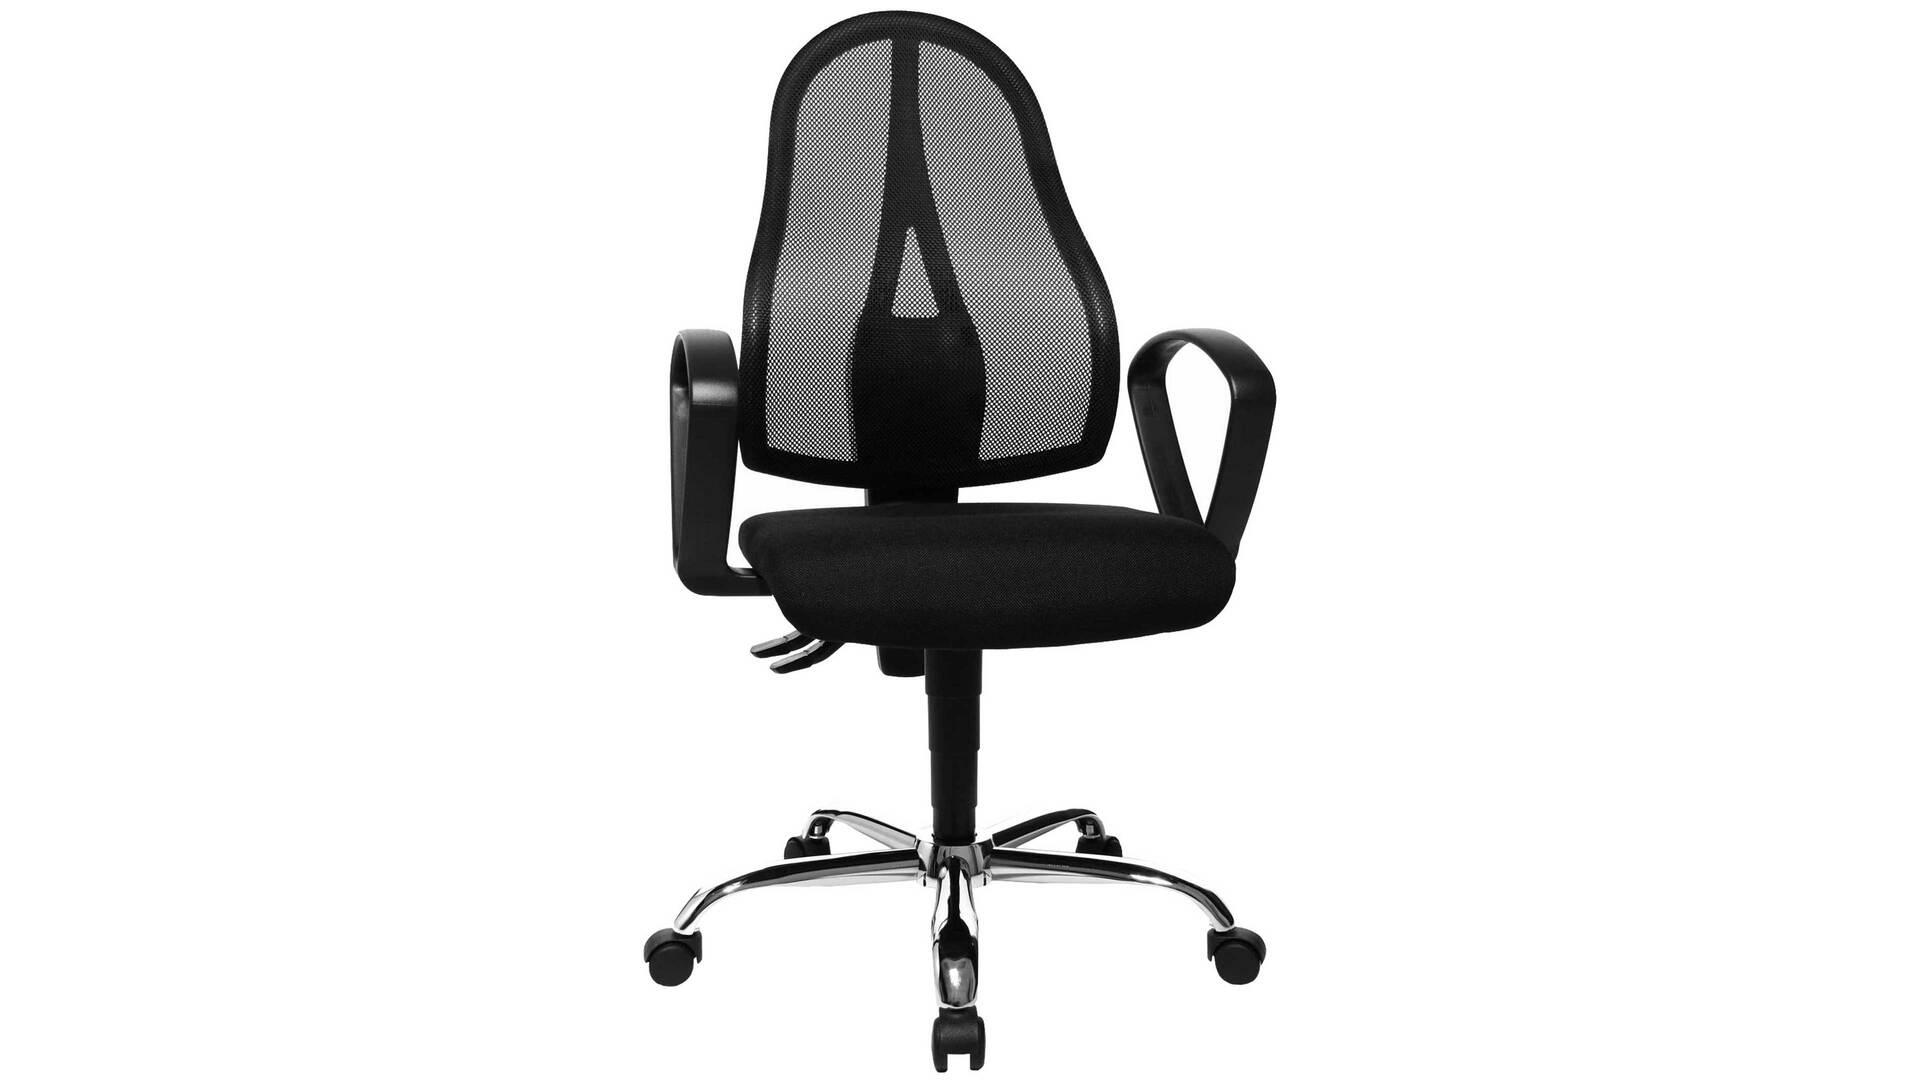 Click&Collect Drehstuhl orthoSedis 20 – Schreibtischstuhl